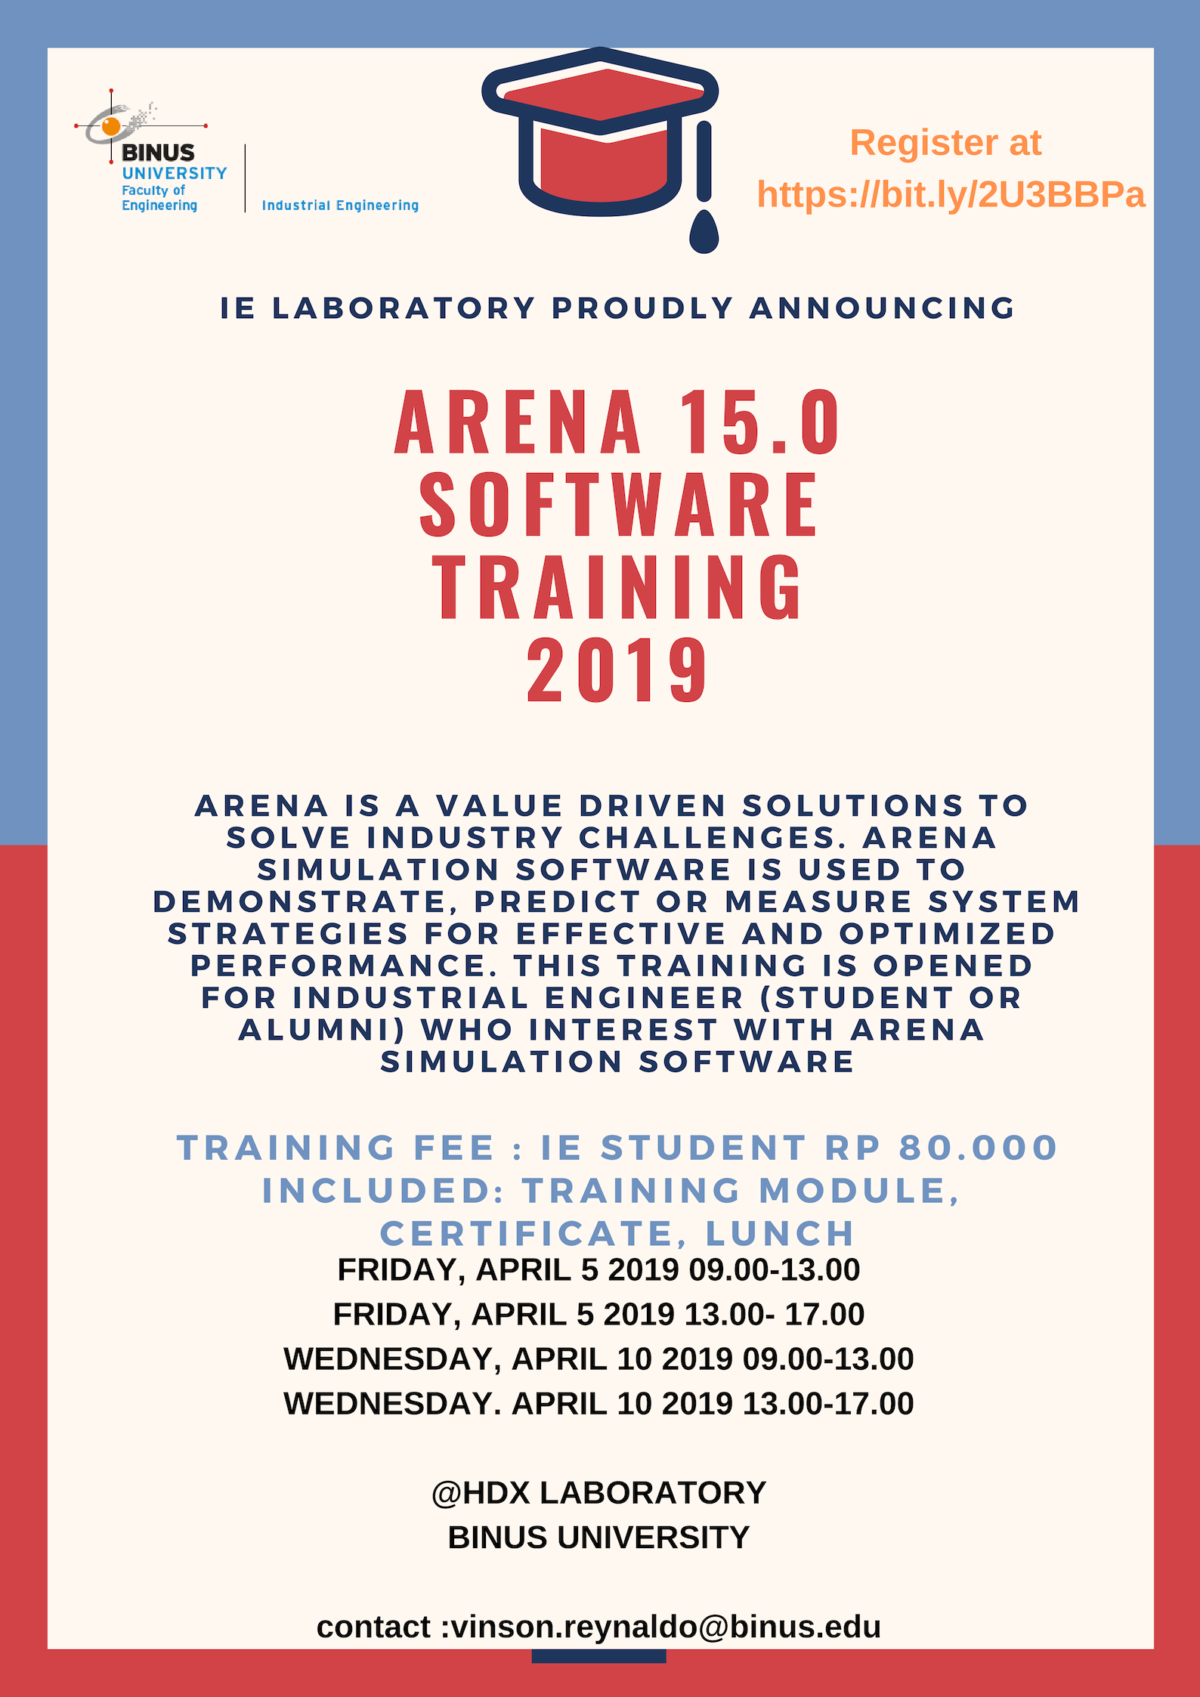 ARENA 15.0 Software Training 2019